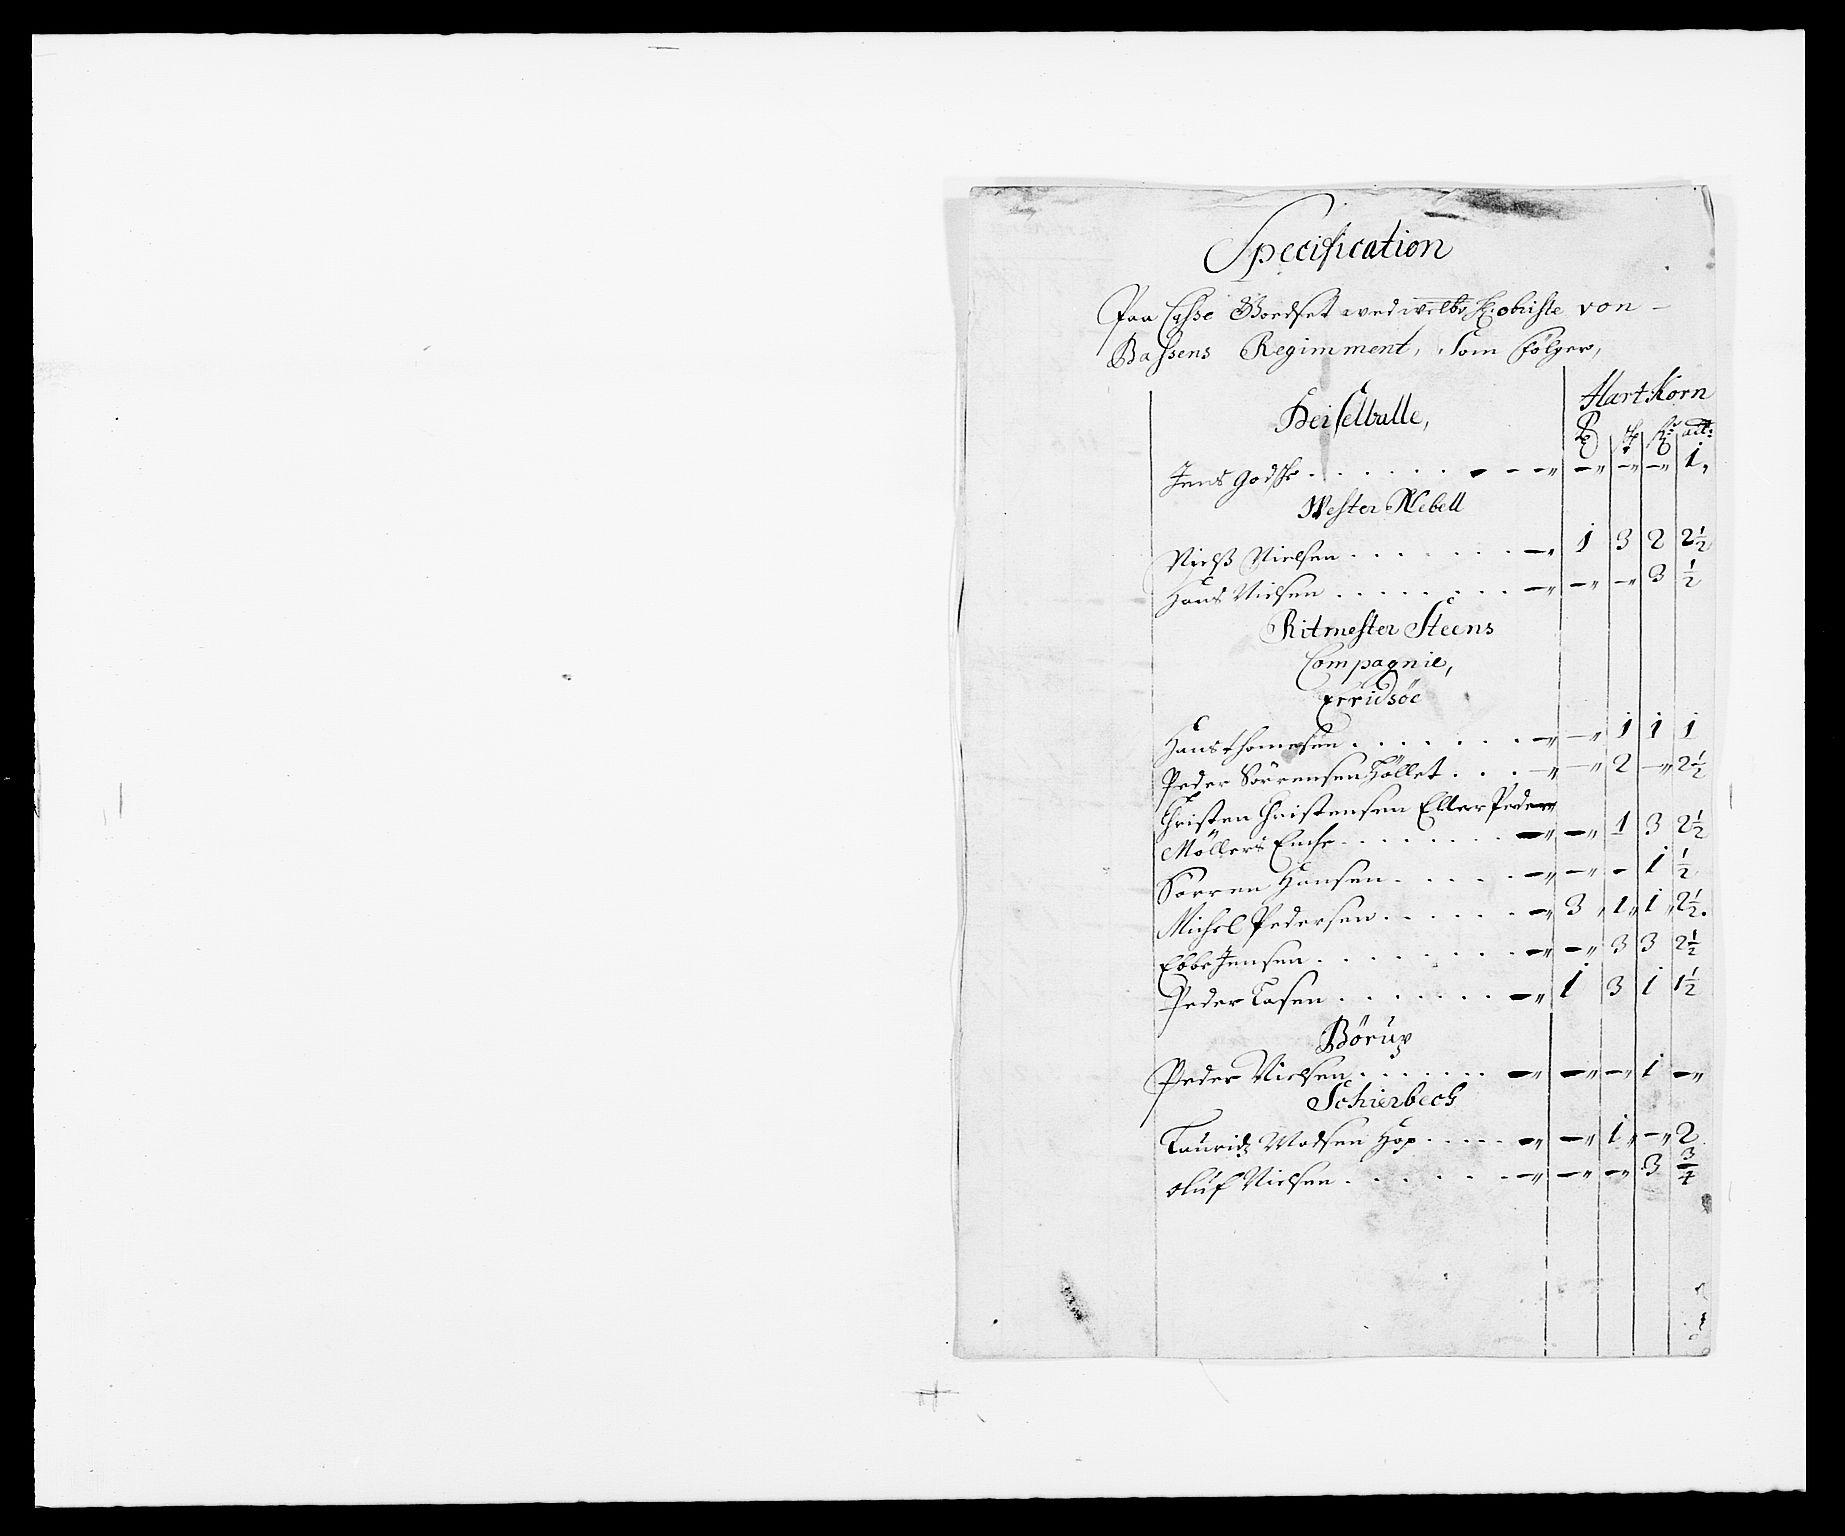 RA, Rentekammeret inntil 1814, Reviderte regnskaper, Fogderegnskap, R32/L1860: Fogderegnskap Jarlsberg grevskap, 1686-1690, s. 221